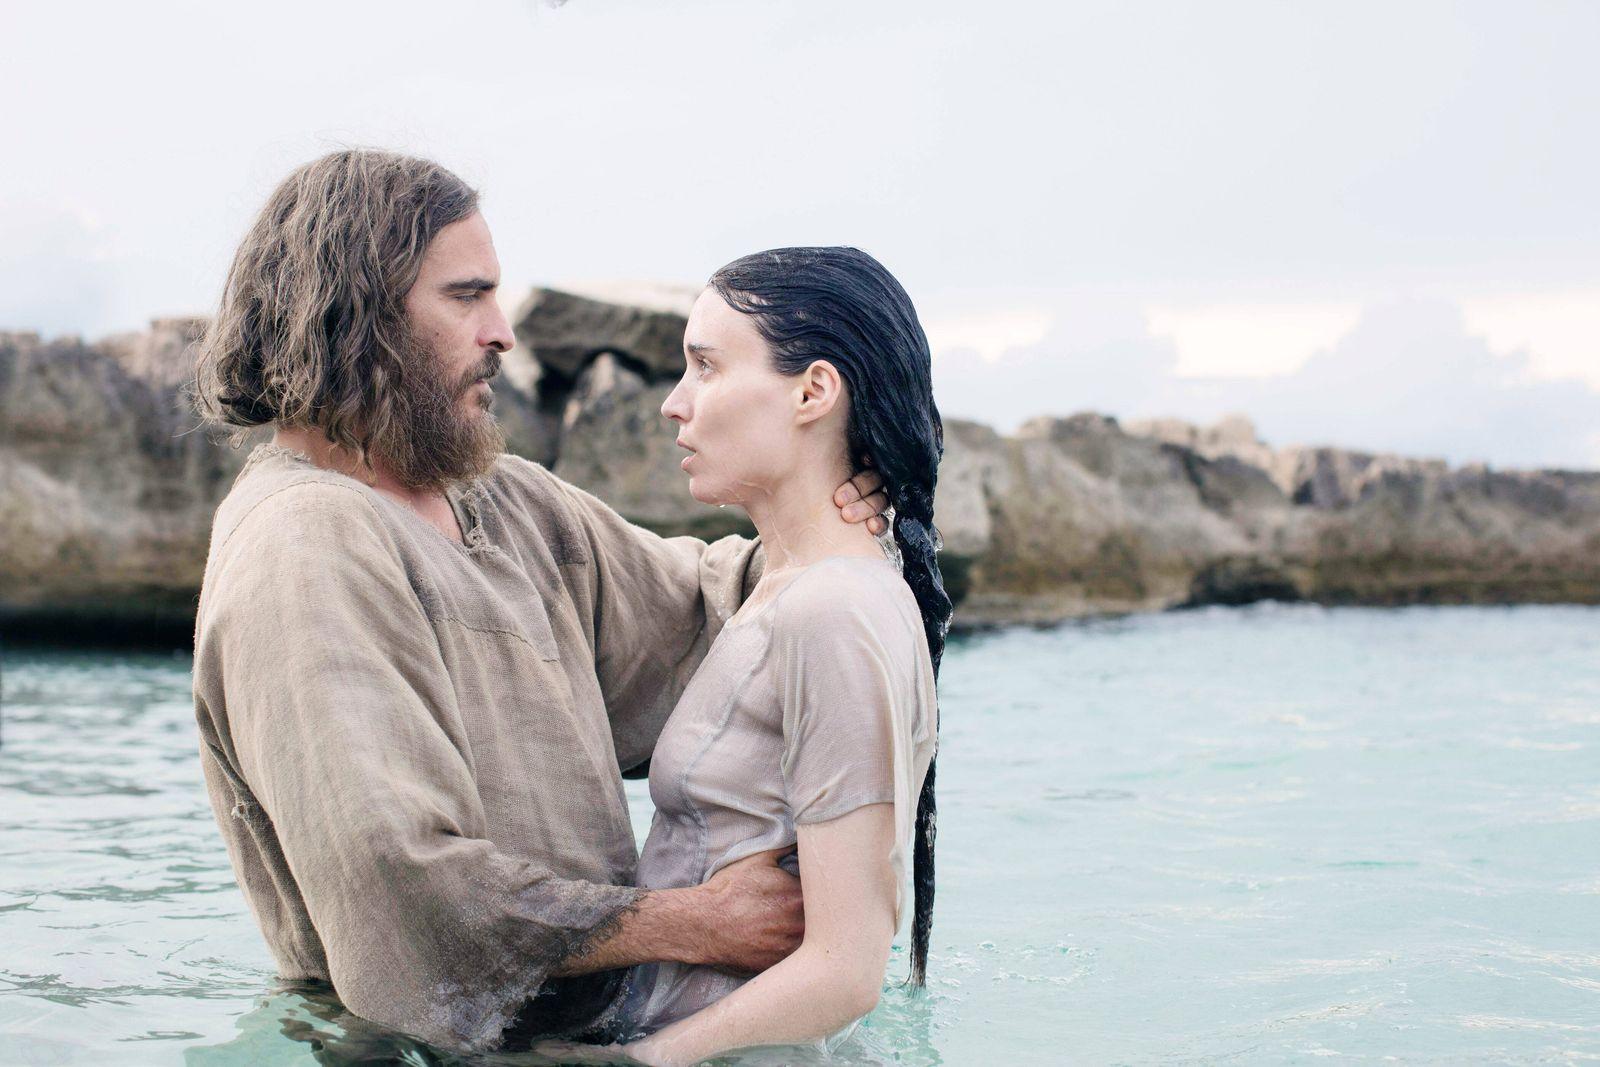 MARY MAGDALENE, from left: Joaquin Phoenix as Jesus, Rooney Mara as Mary Magdalene, 2018. ph: Jonathan Olley / IFC Films